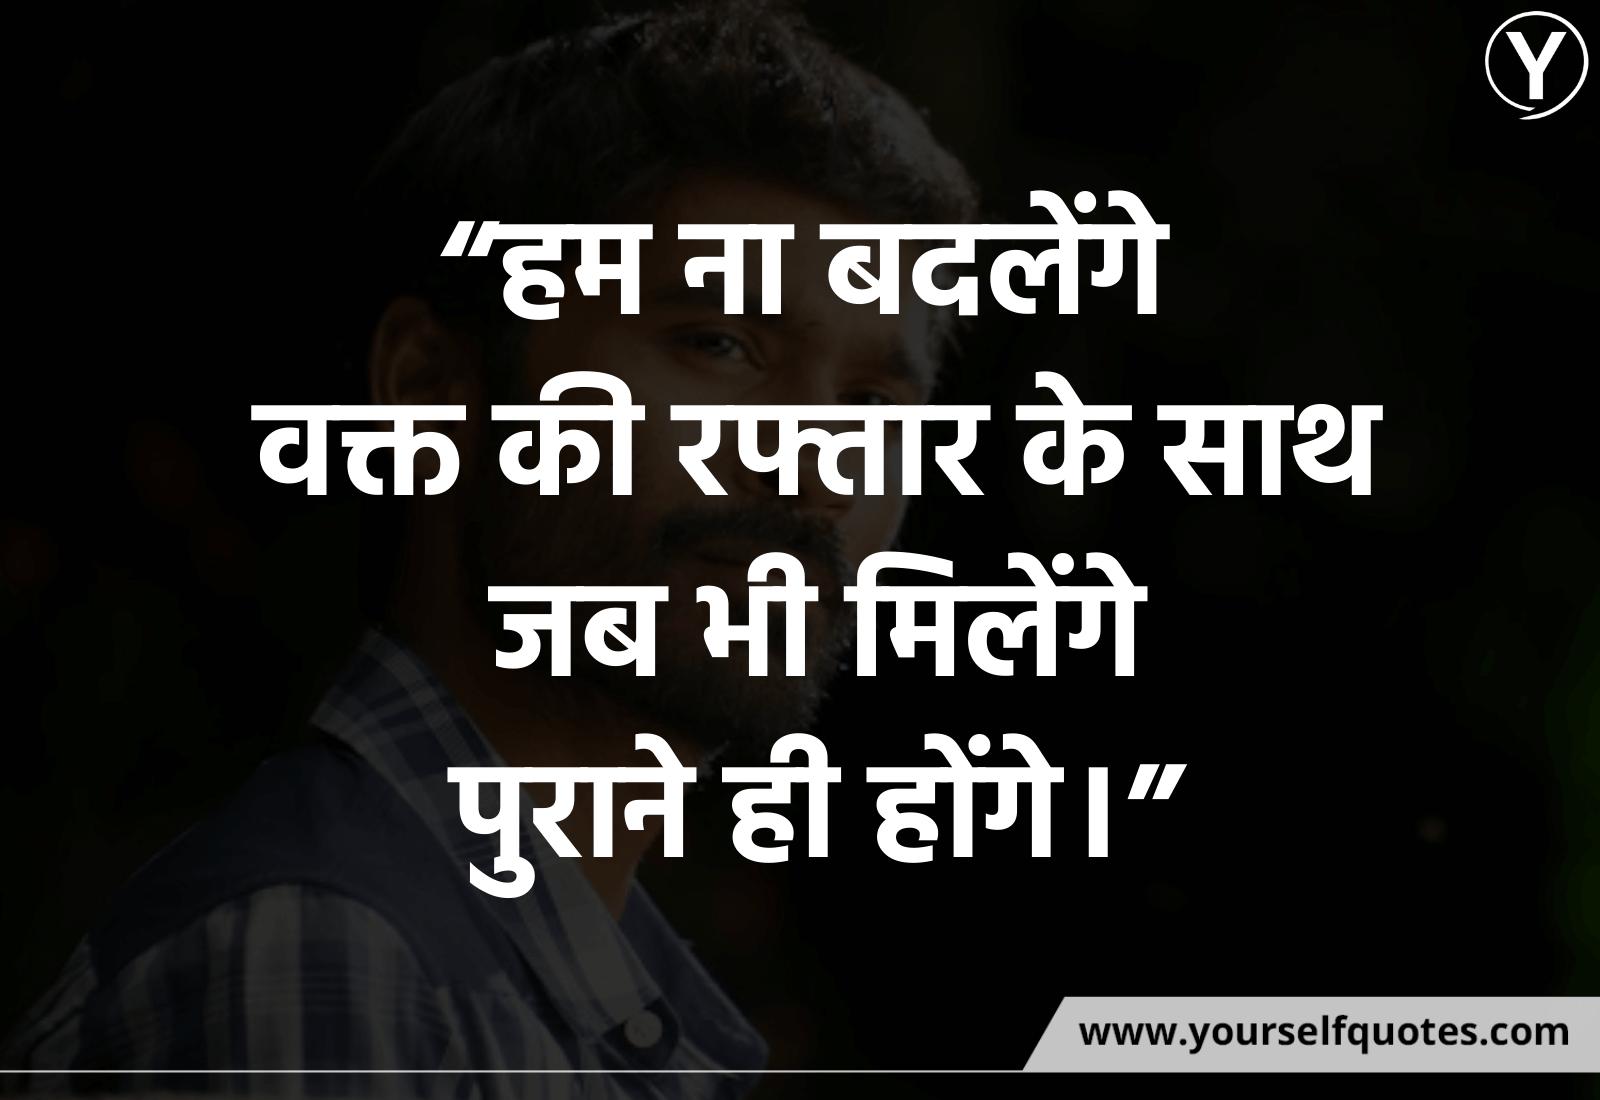 एटीट्यूड शायरी - Attitude Shayari in Hindi